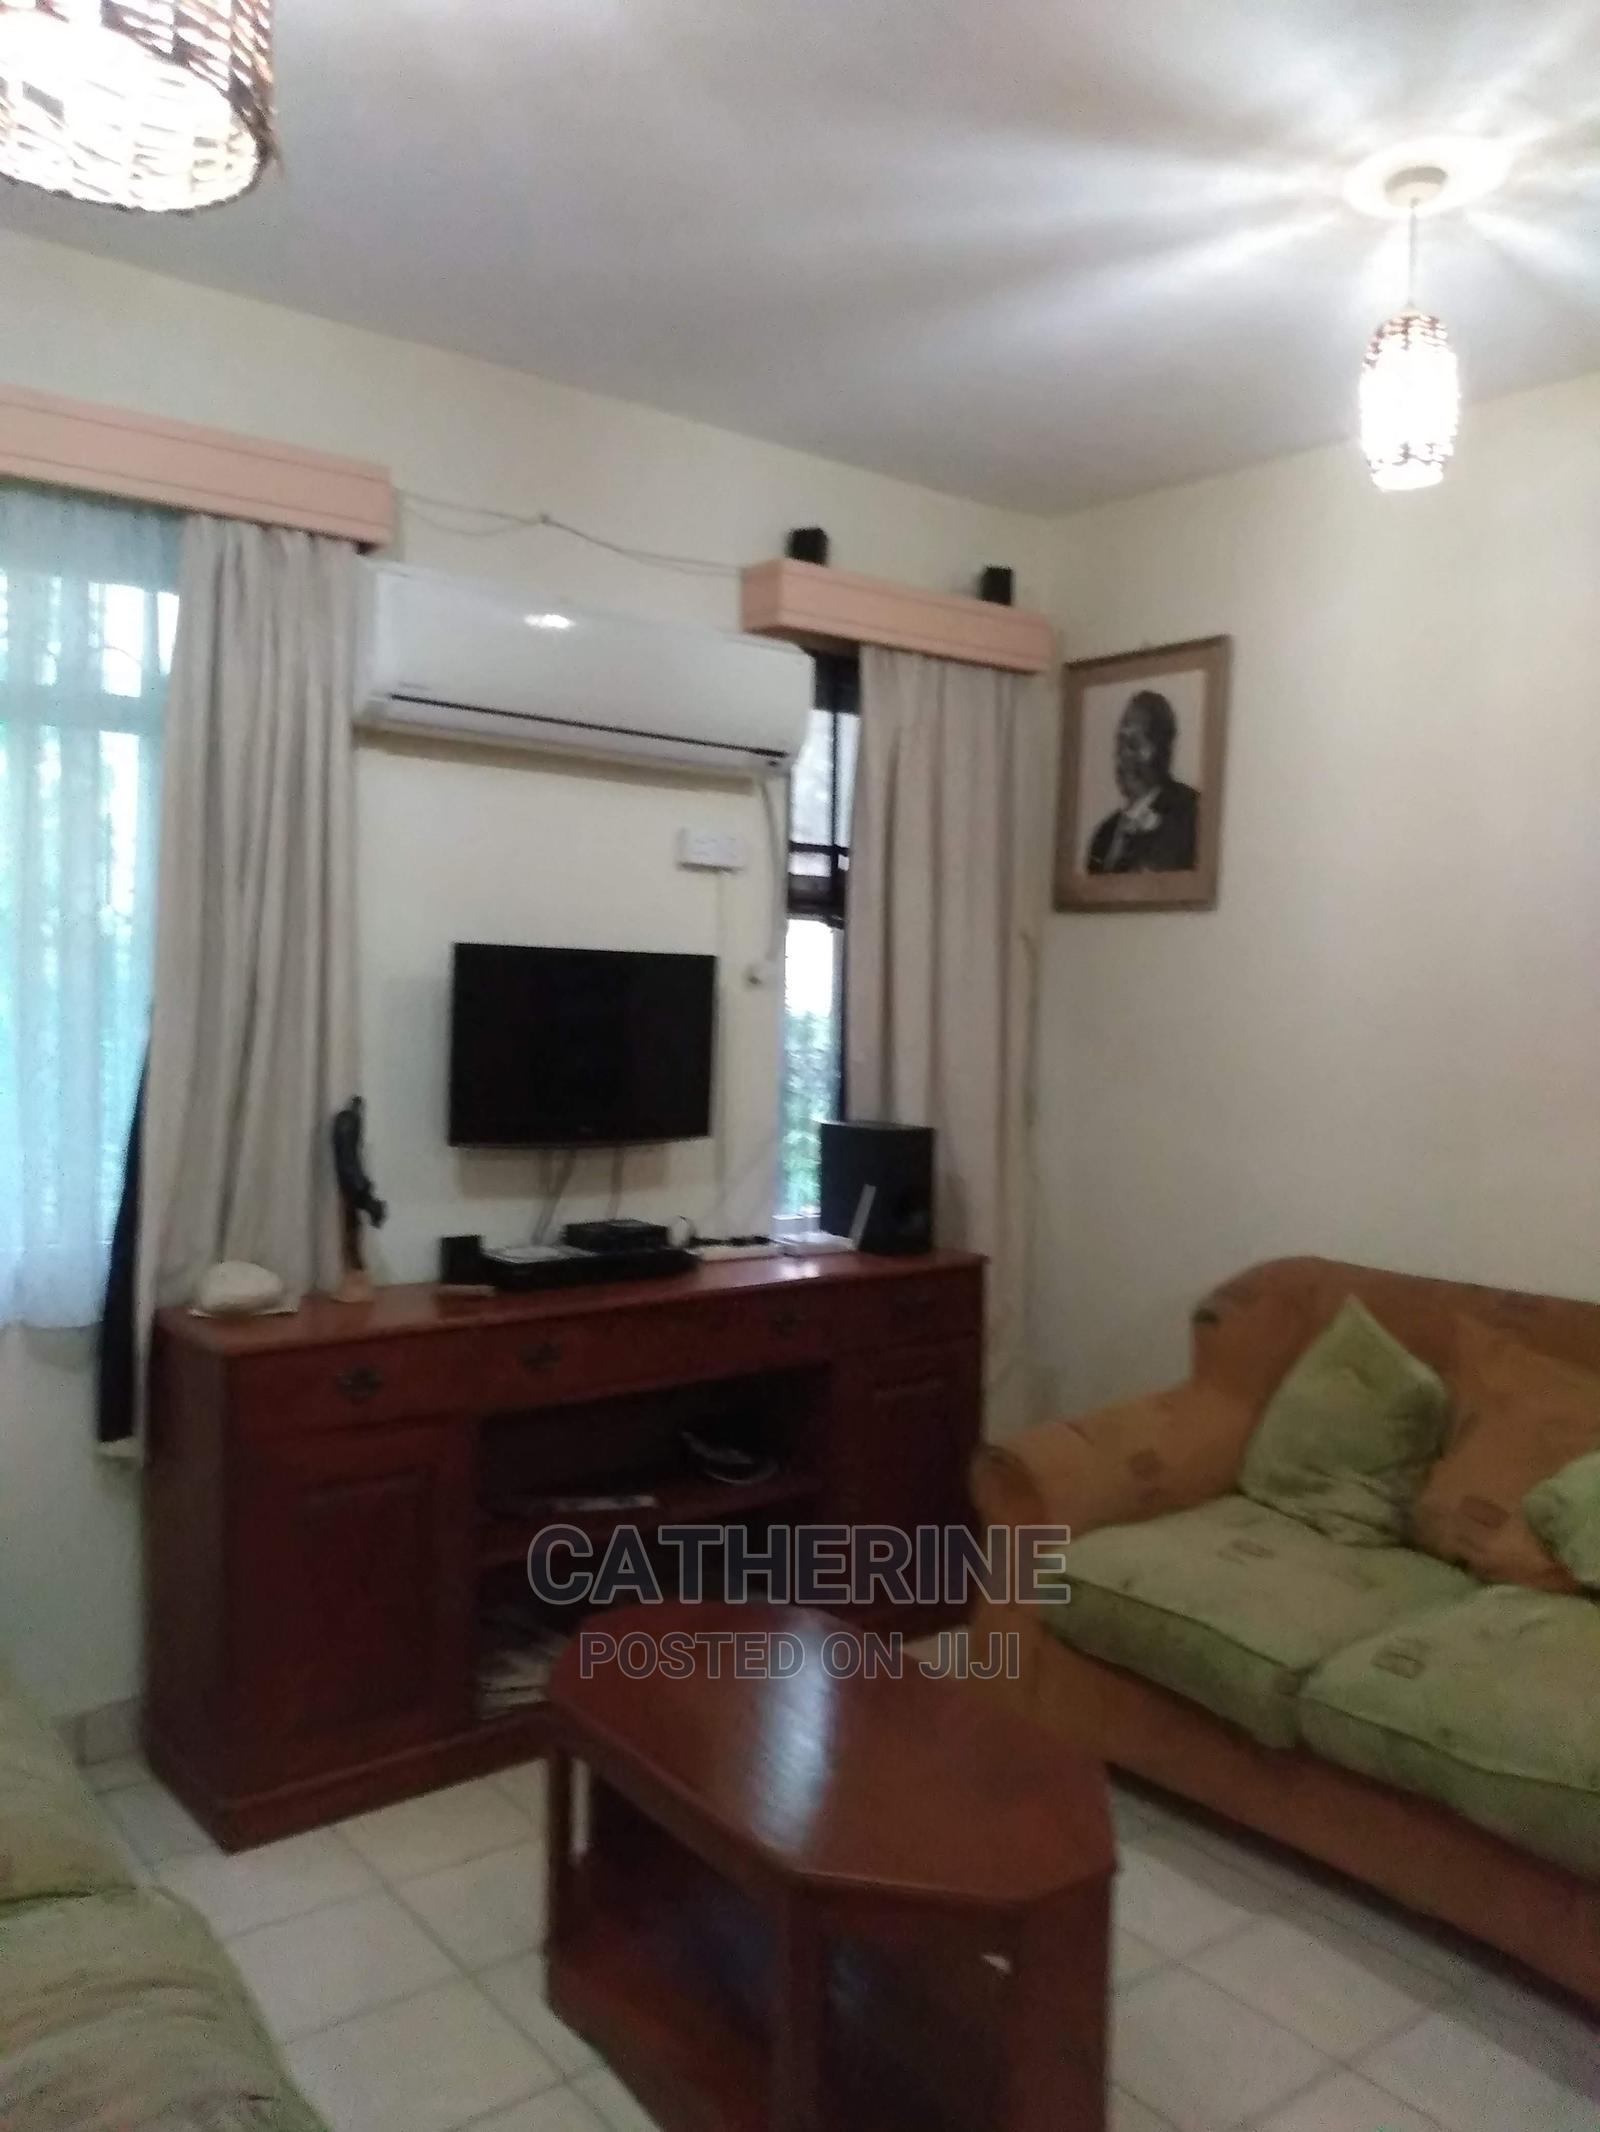 3 Bedroom Masionette SQ Bandari, Bombolulu Mombasa | Houses & Apartments For Sale for sale in Ziwa la Ngombe, Nyali, Kenya